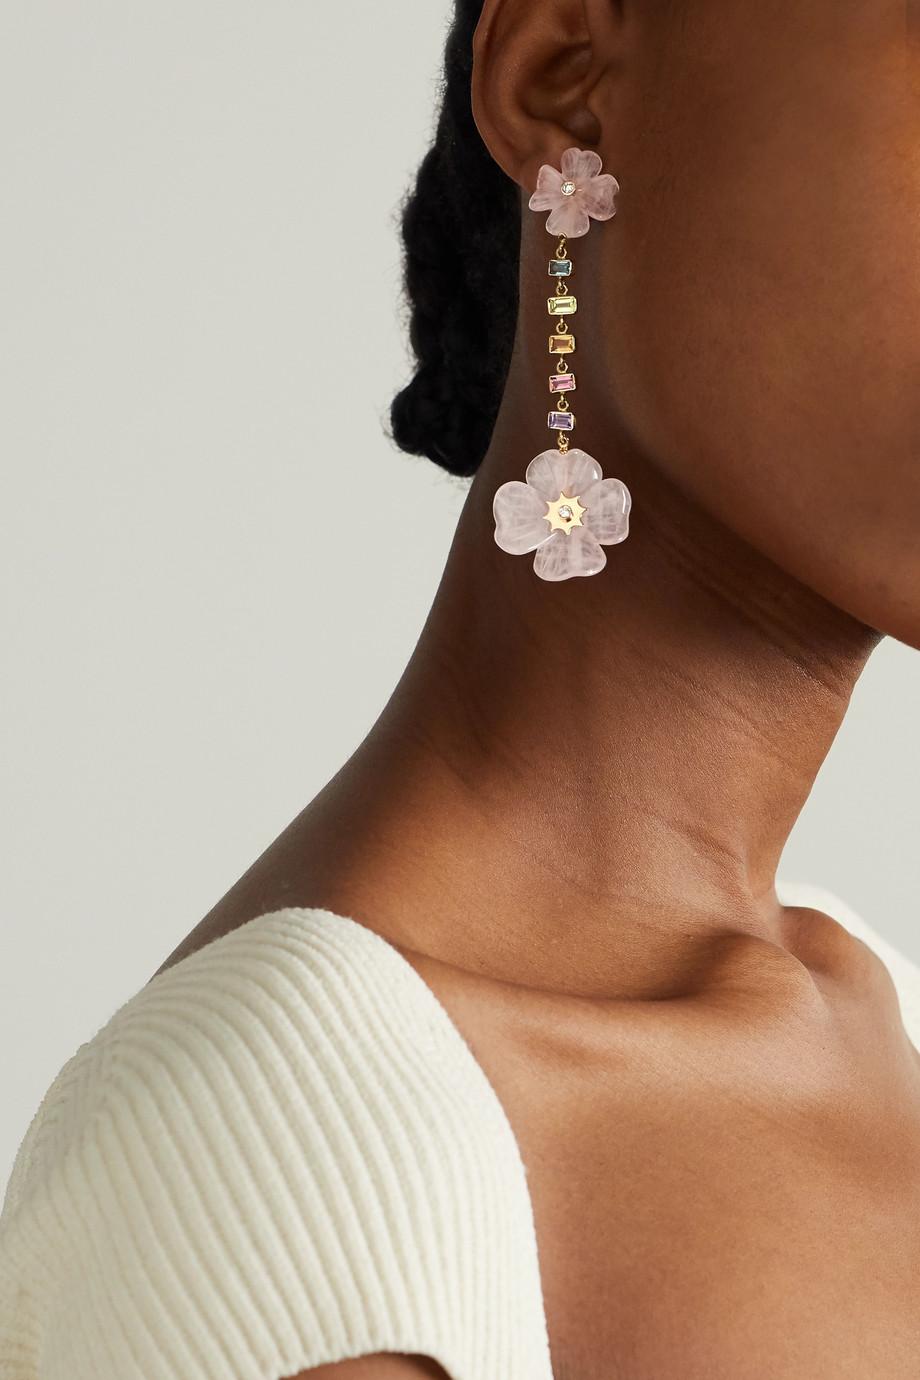 Brent Neale Double Clover 18-karat gold multi-stone earrings